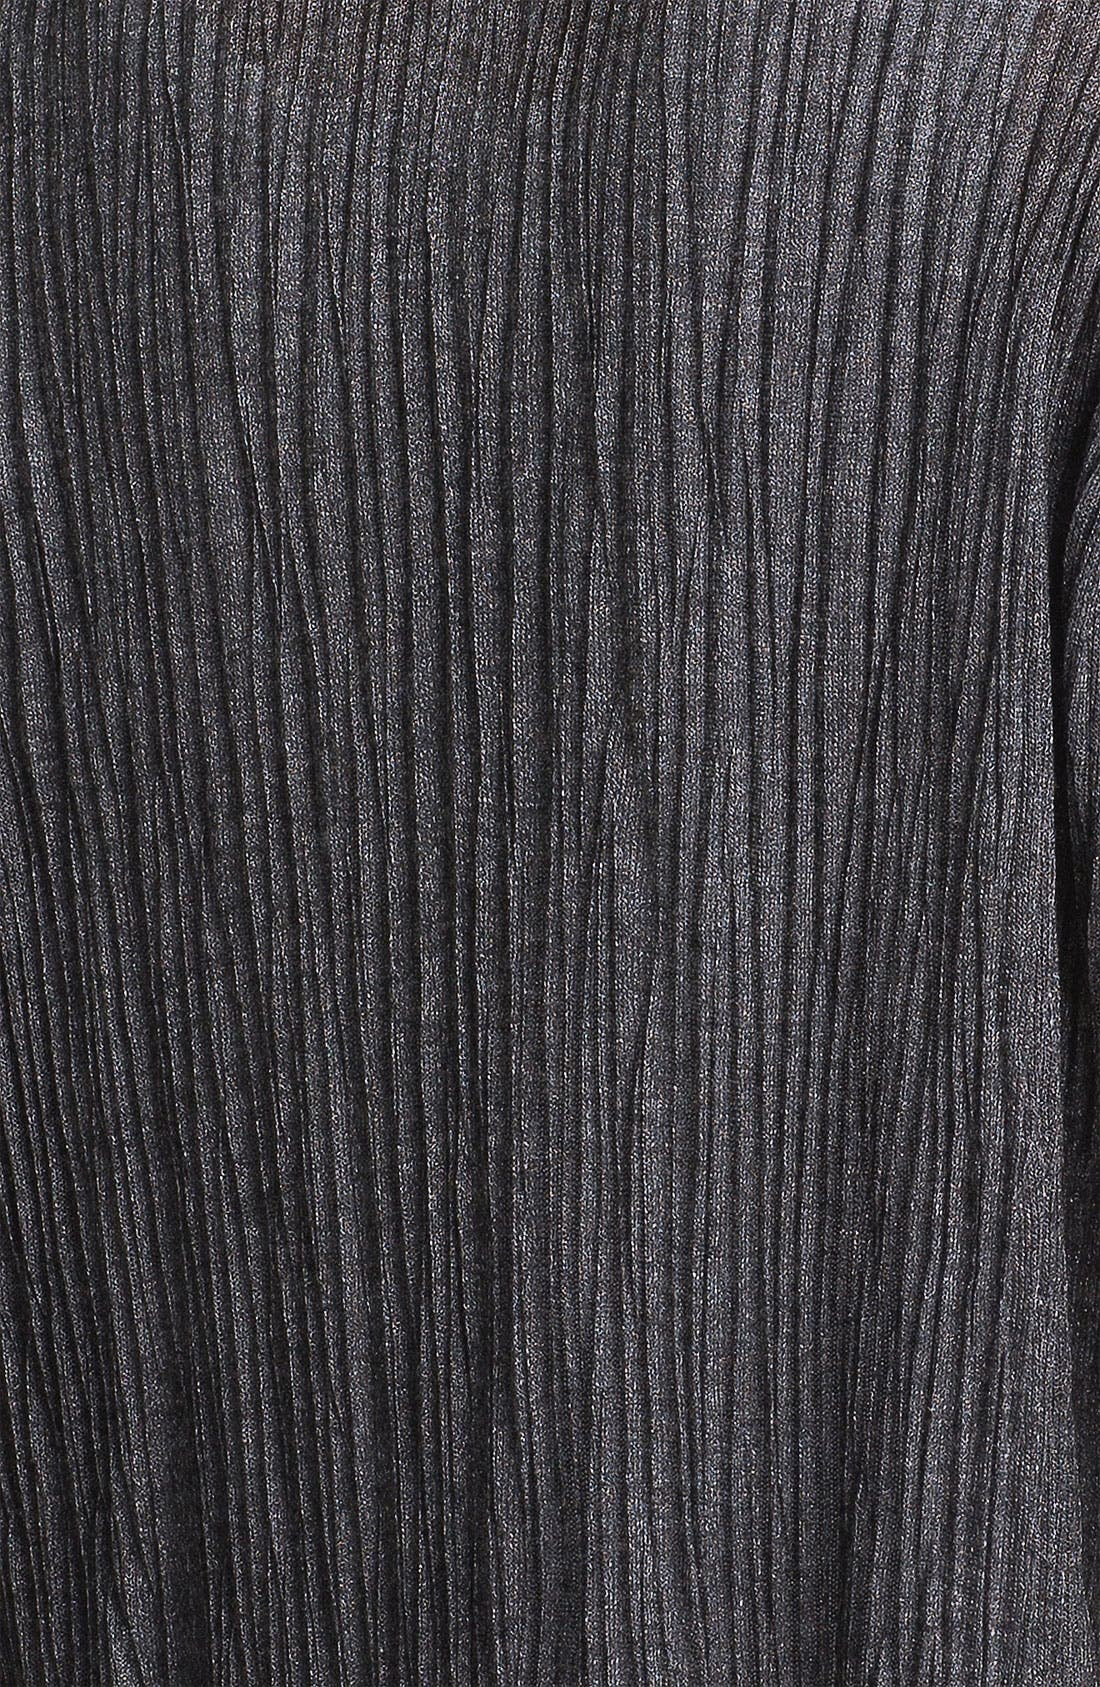 Alternate Image 3  - Eileen Fisher Crinkled Short Sleeve Cardigan (Petite)